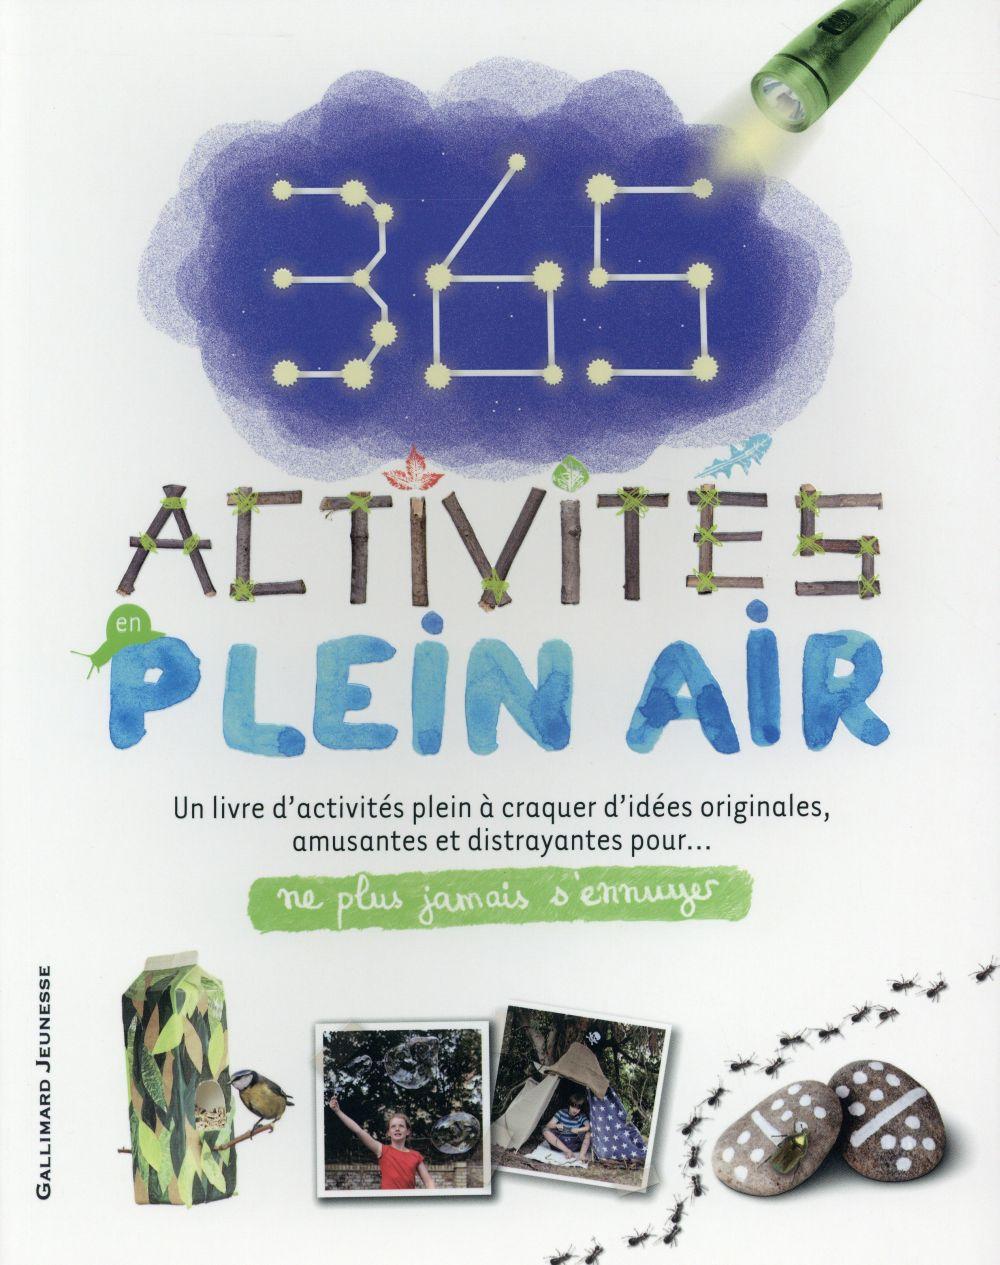 365 ACTIVITES EN PLEIN AIR AMBROSE JAMIE Gallimard-Jeunesse